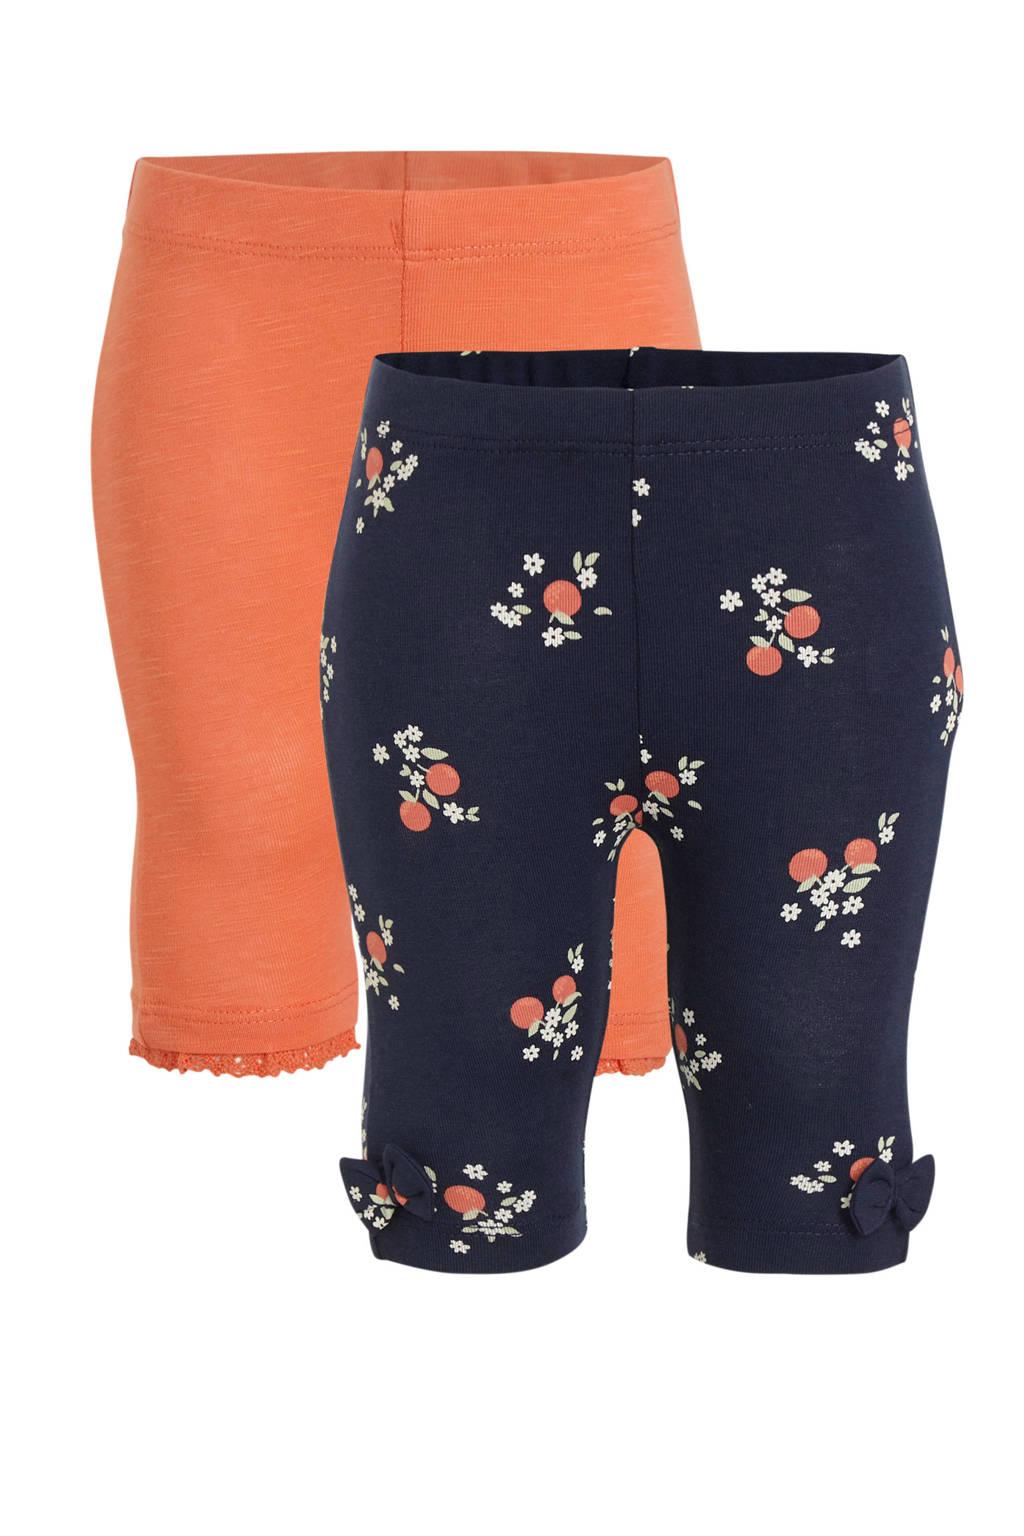 C&A Baby Club capri legging - set van 2 roze/donkerblauw, Donkerblauw